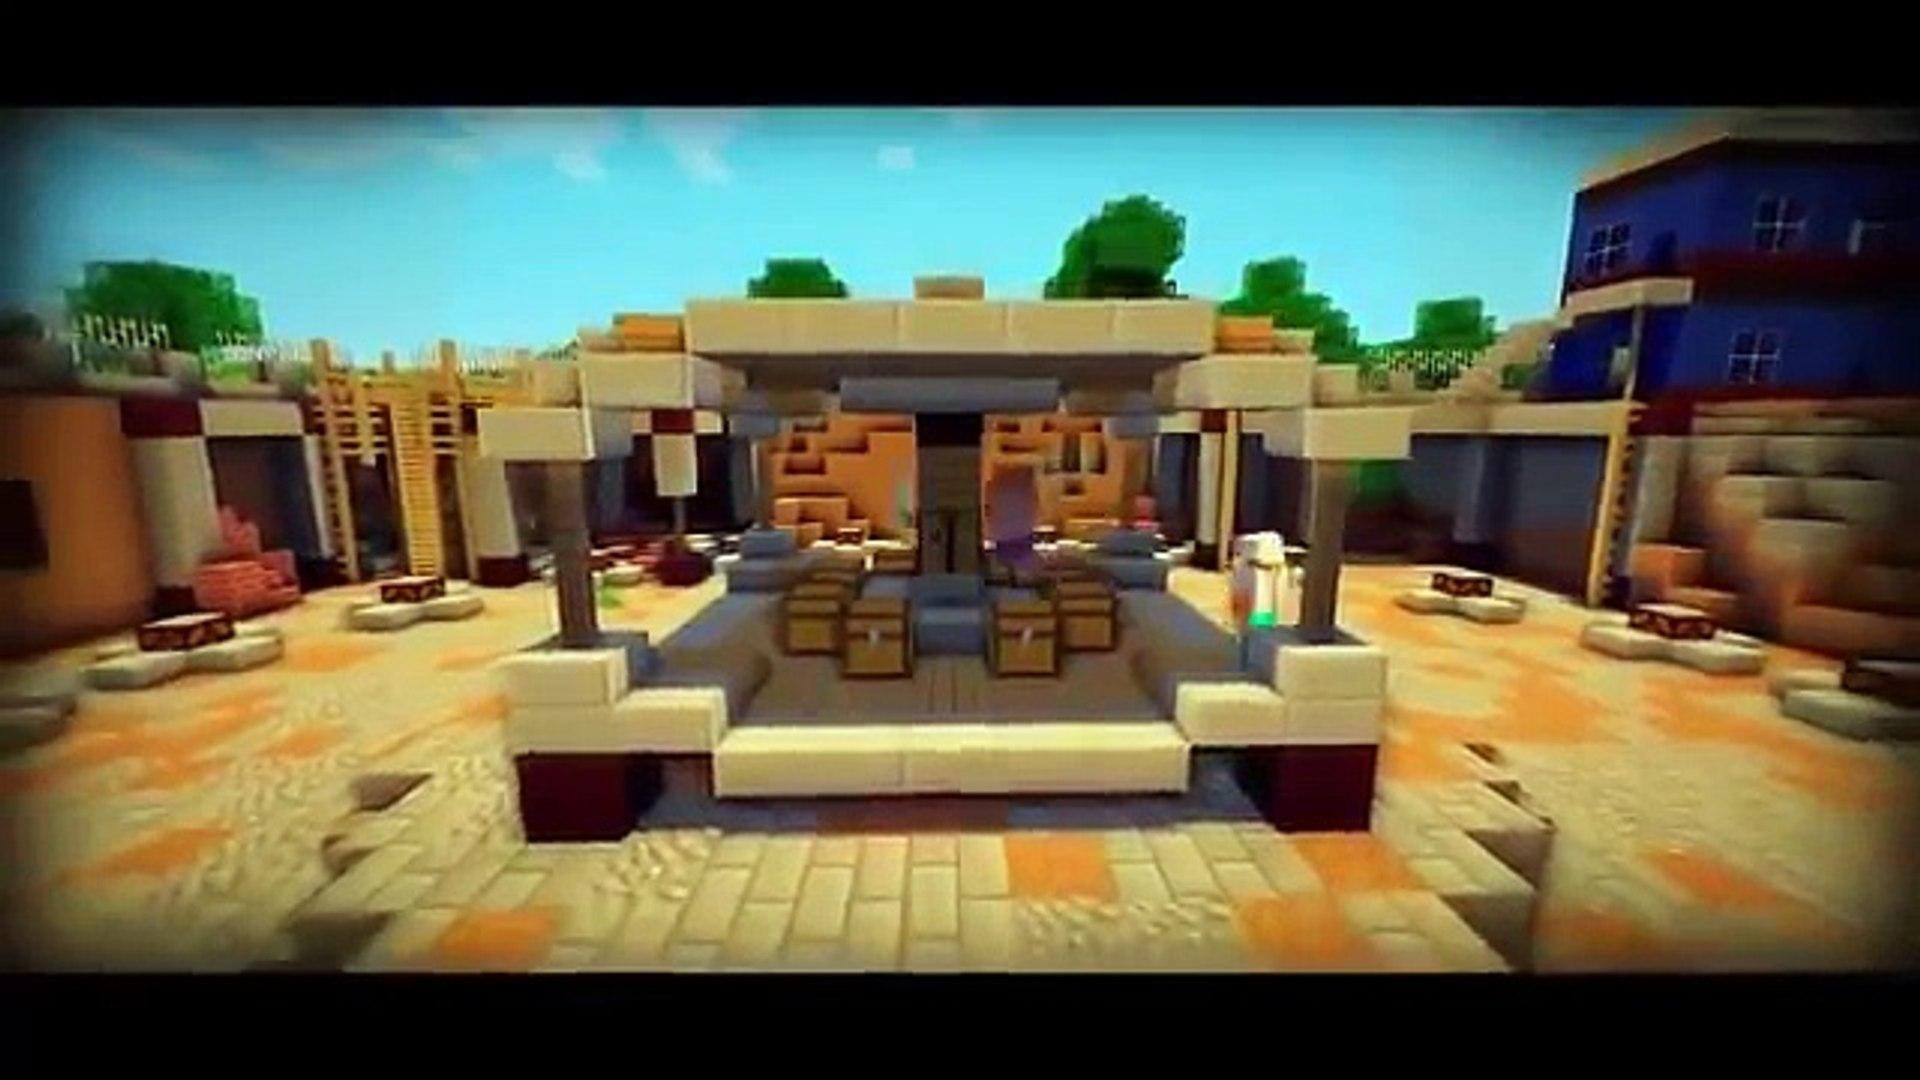 [Minecraft] Top 10 Minecraft Songs/Animations/Parodies 2014 - Best Minecraft Song/Animation/Parody!